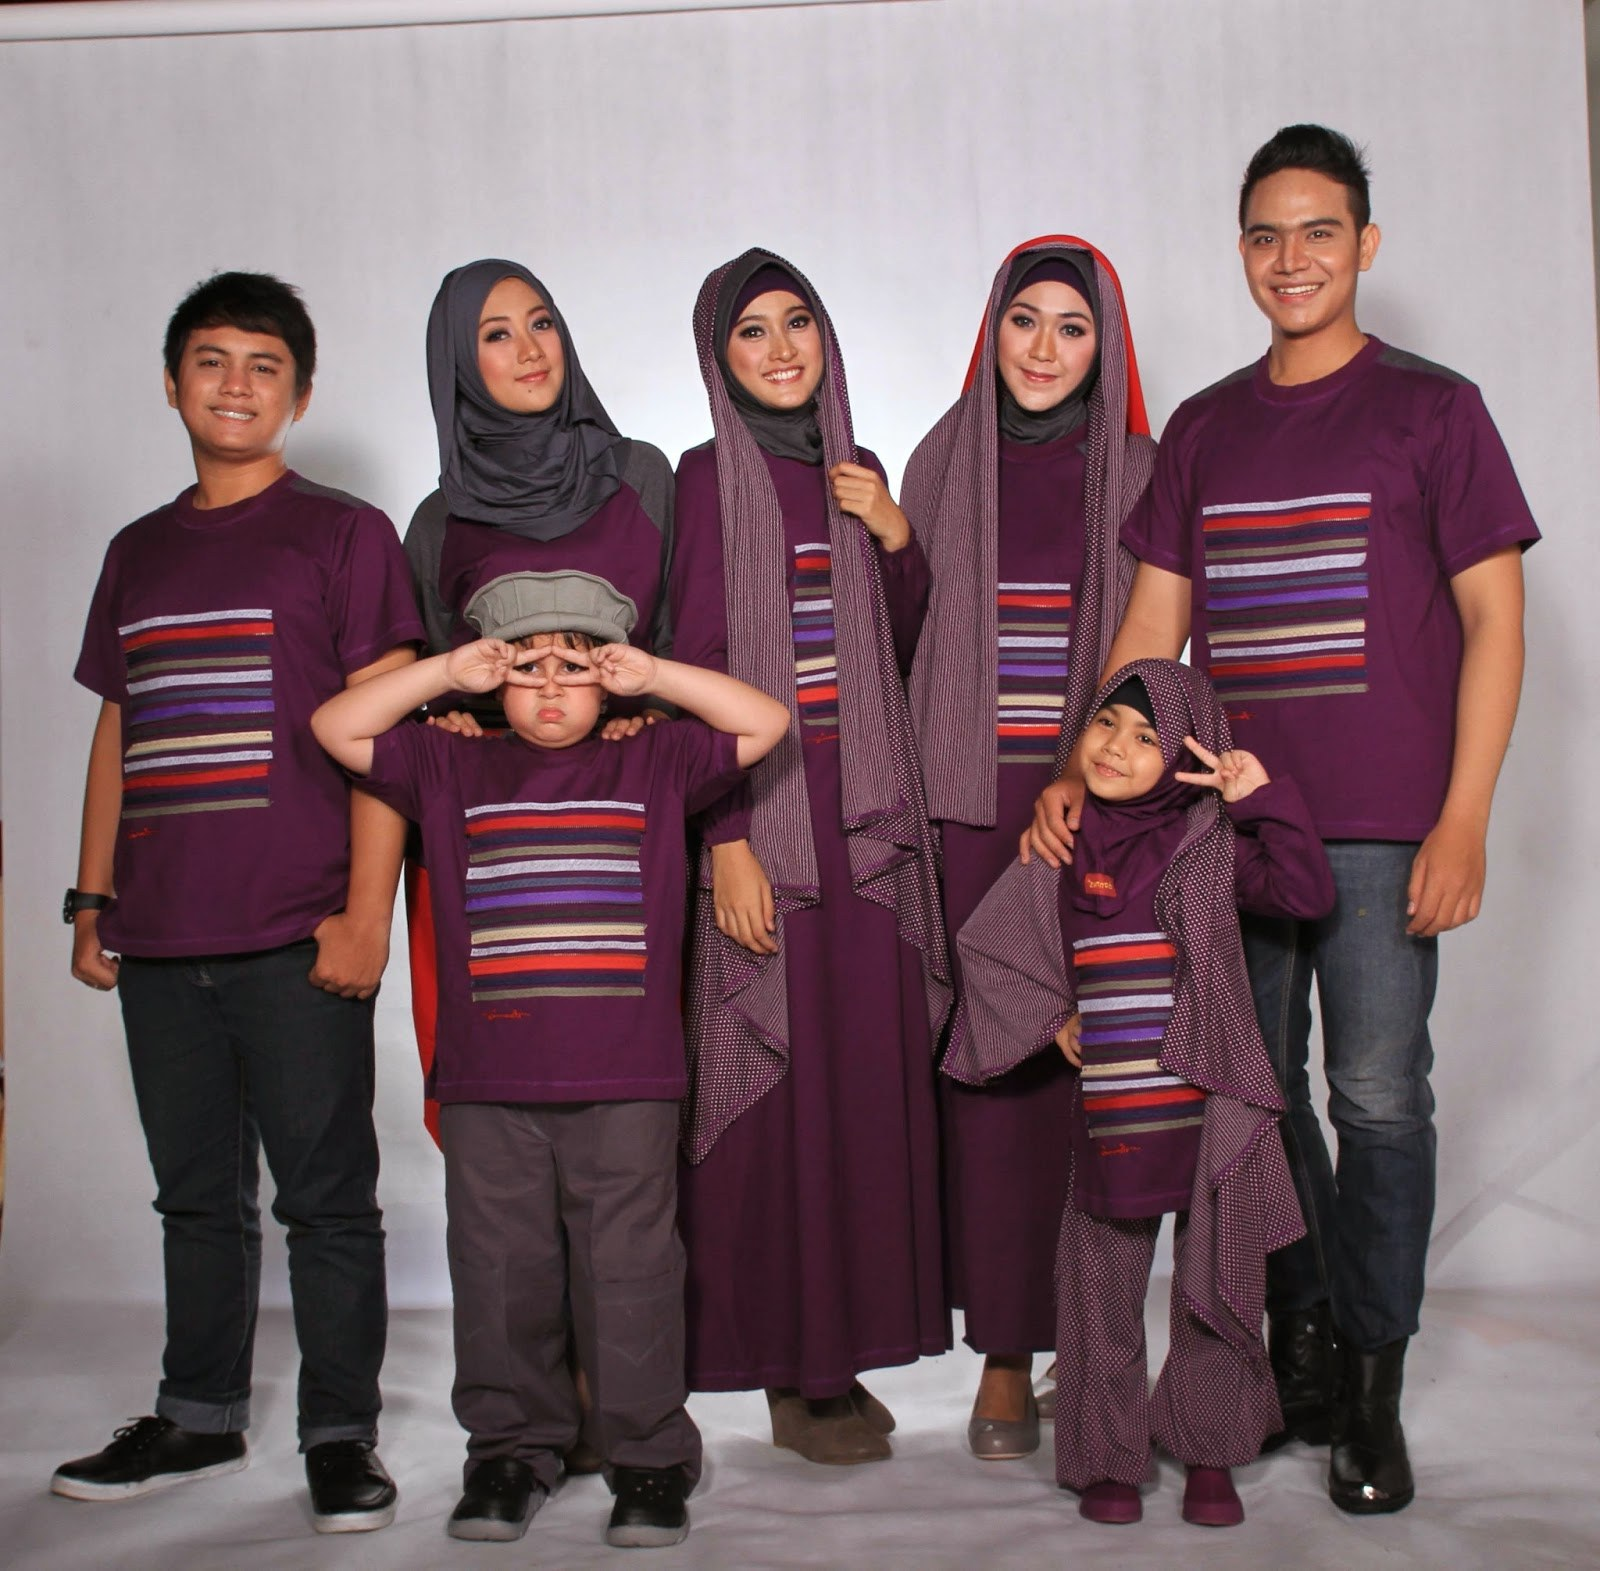 Ide Model Baju Lebaran 2018 Untuk orang Gemuk Dddy Model Baju Keluarga Untuk Hari Raya Lebaran 2018